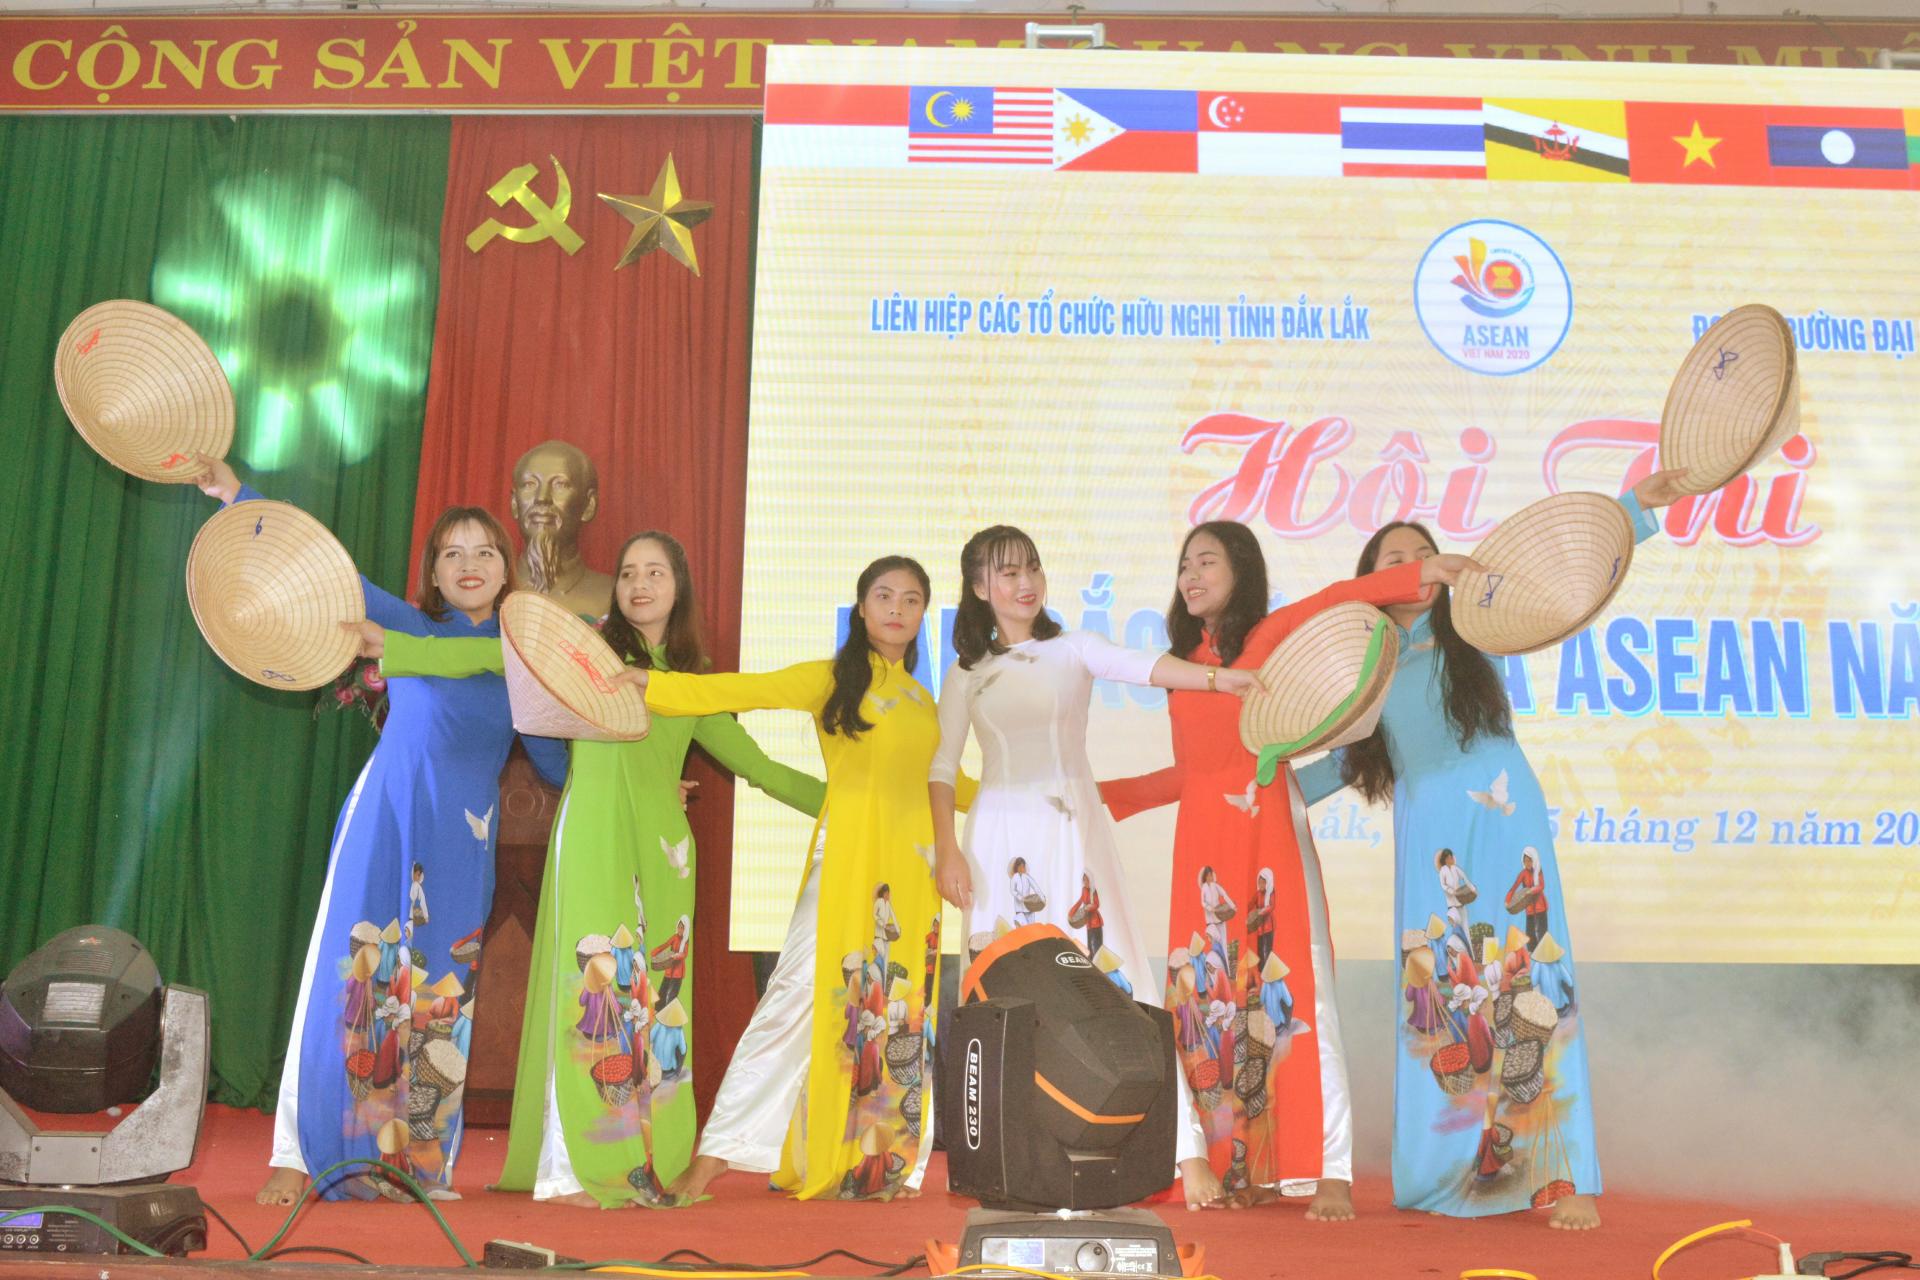 asean cultural identity contest 2020 held in dak lak